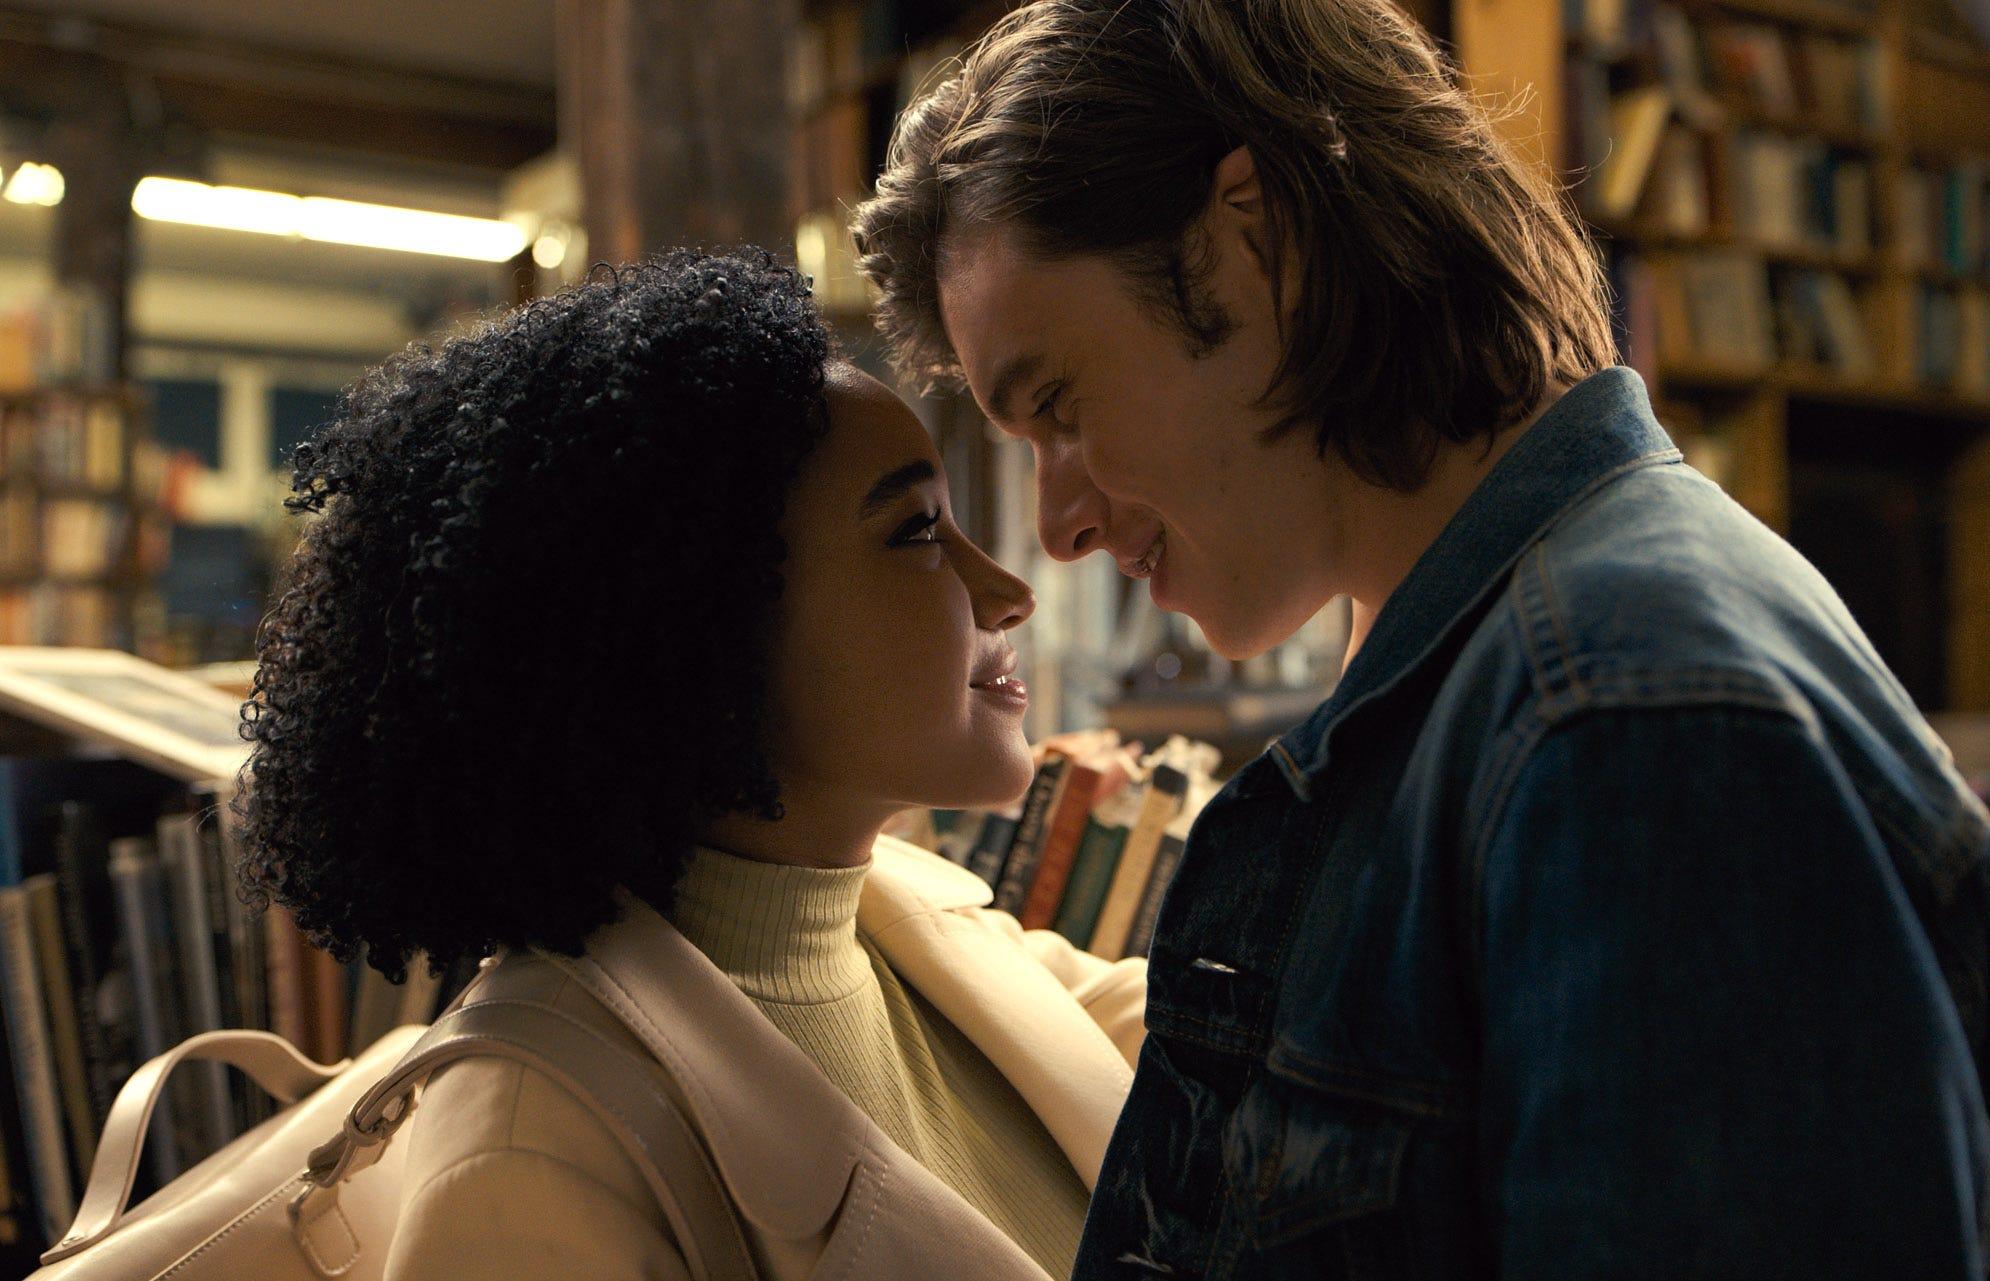 Top interracial dating movies